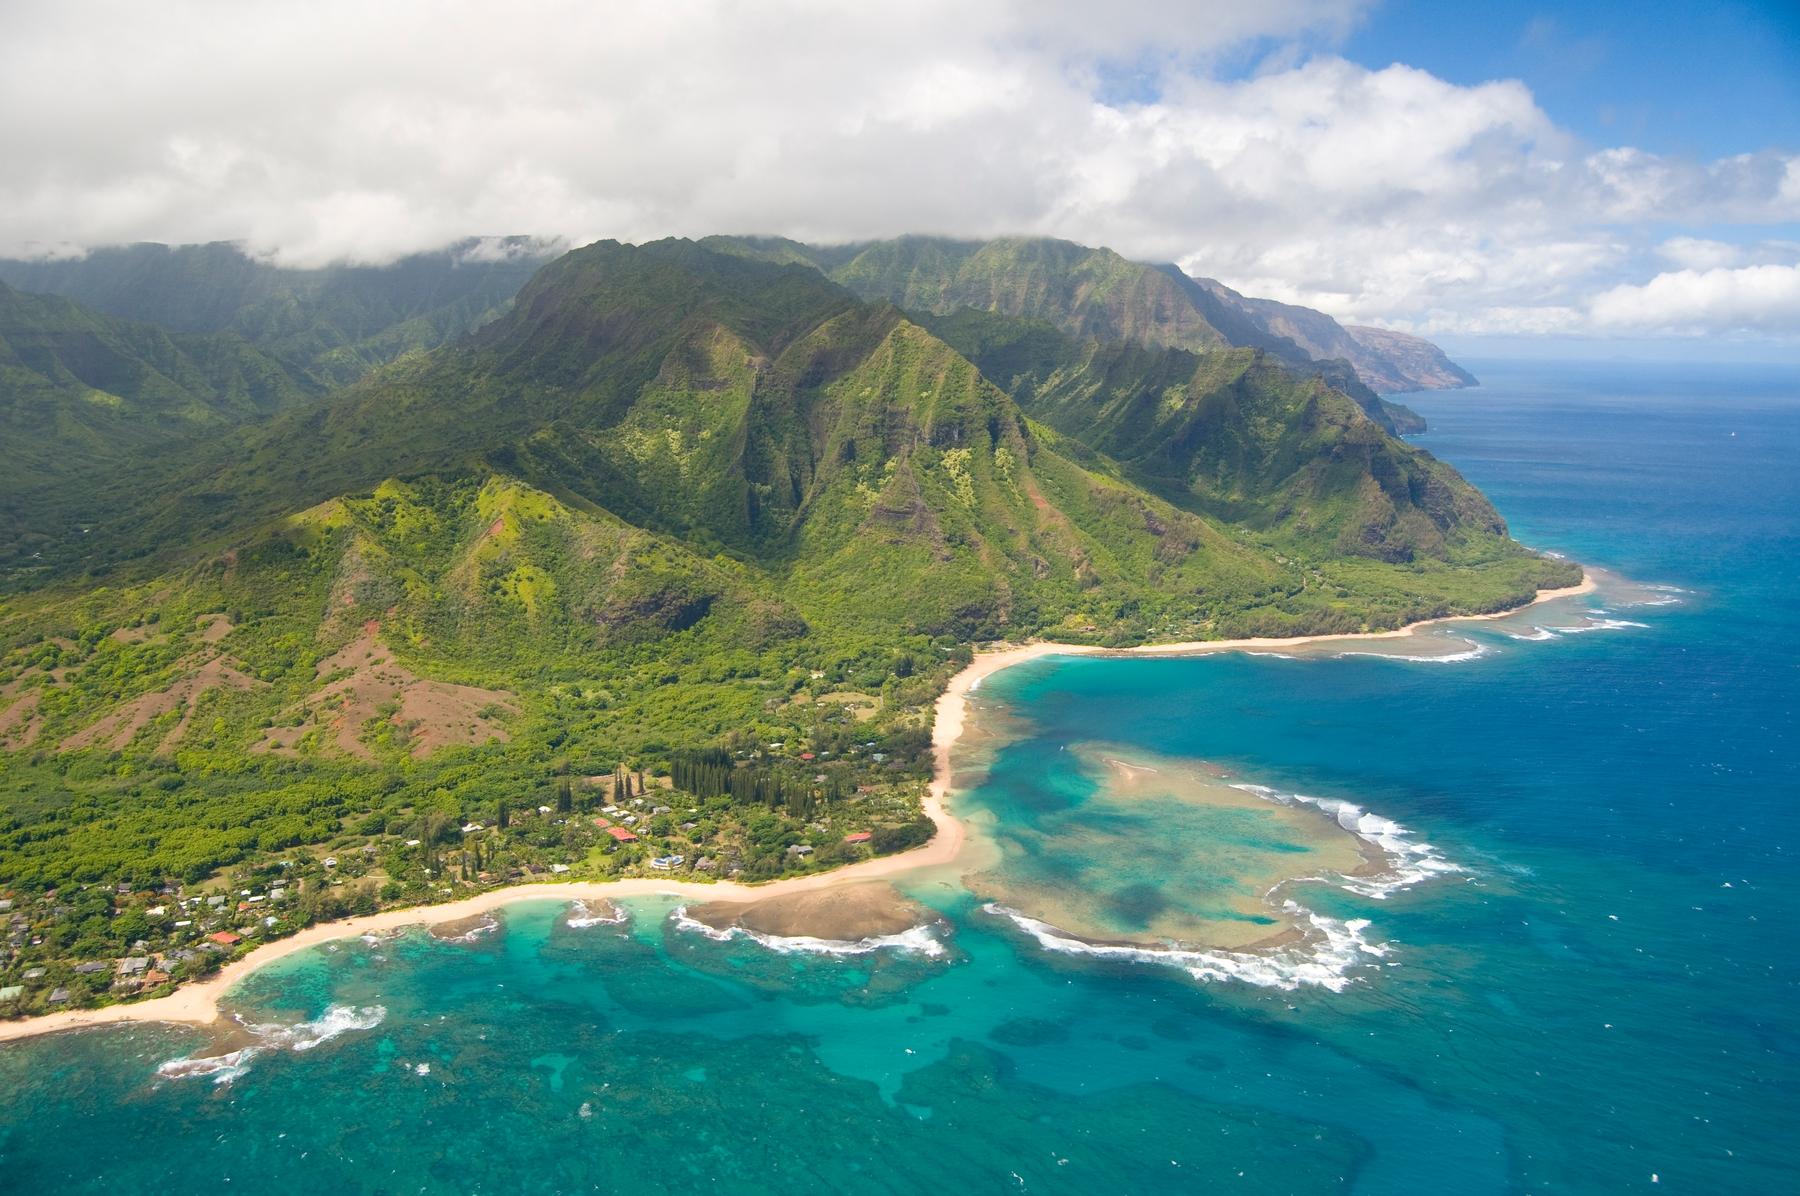 Aerial view of Hawaii coast